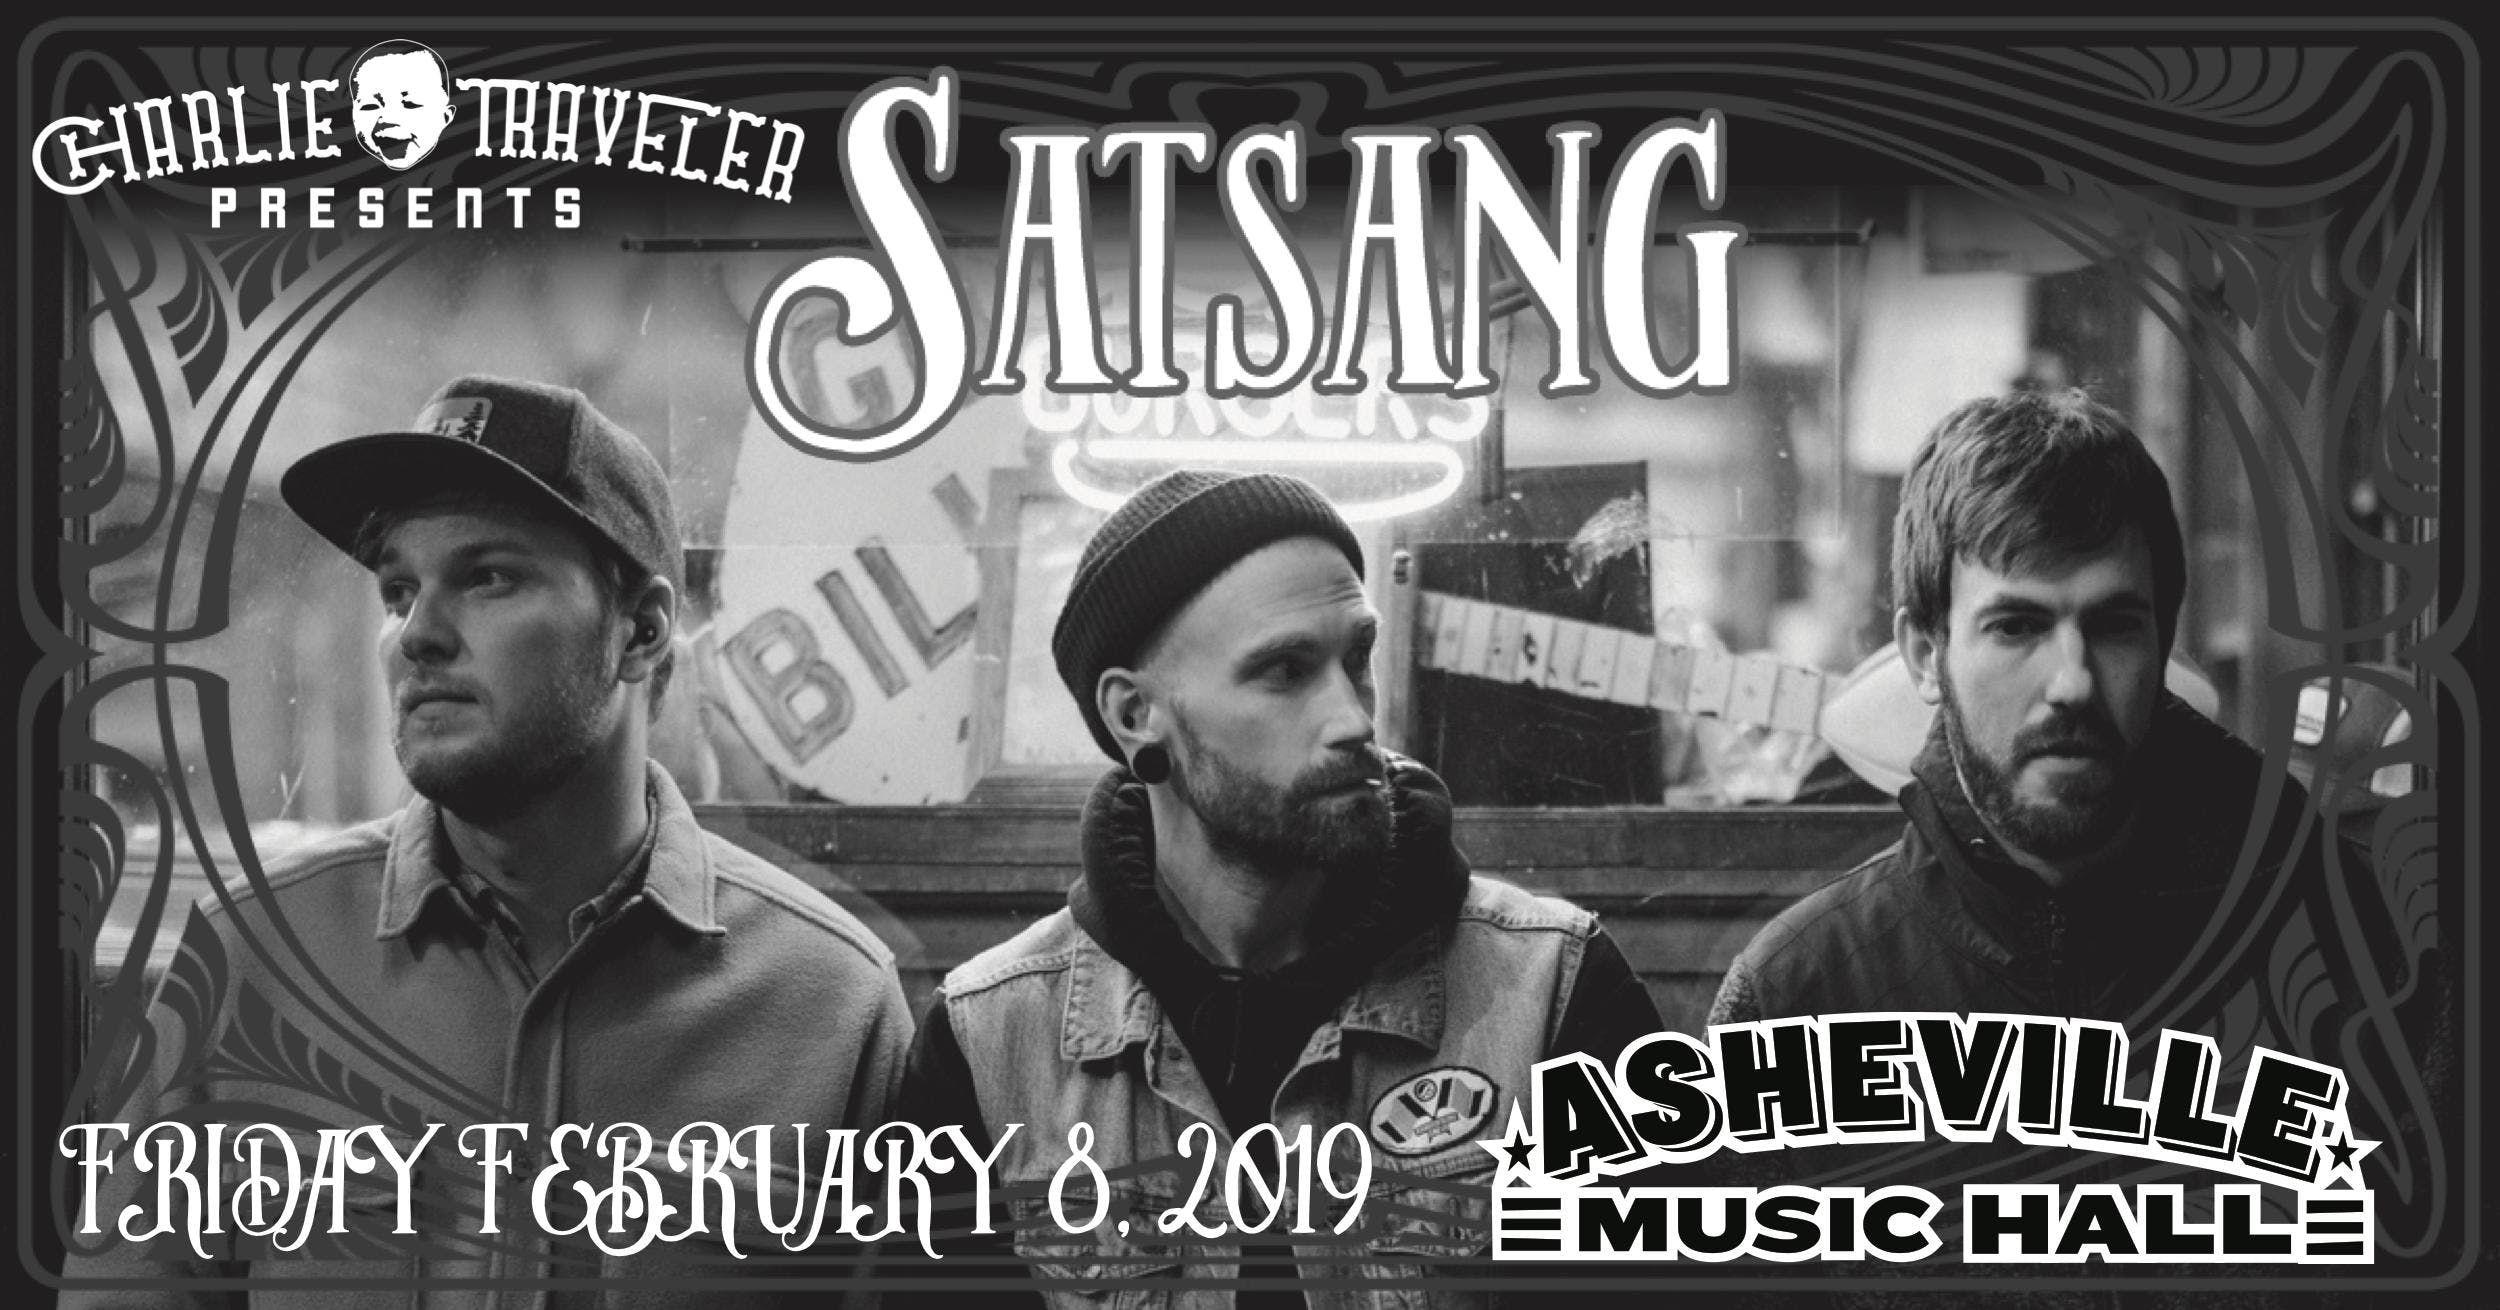 CHARLIE TRAVELER PRESENTS An Evening with Satsang - [folk  soul  indie  hip hop]